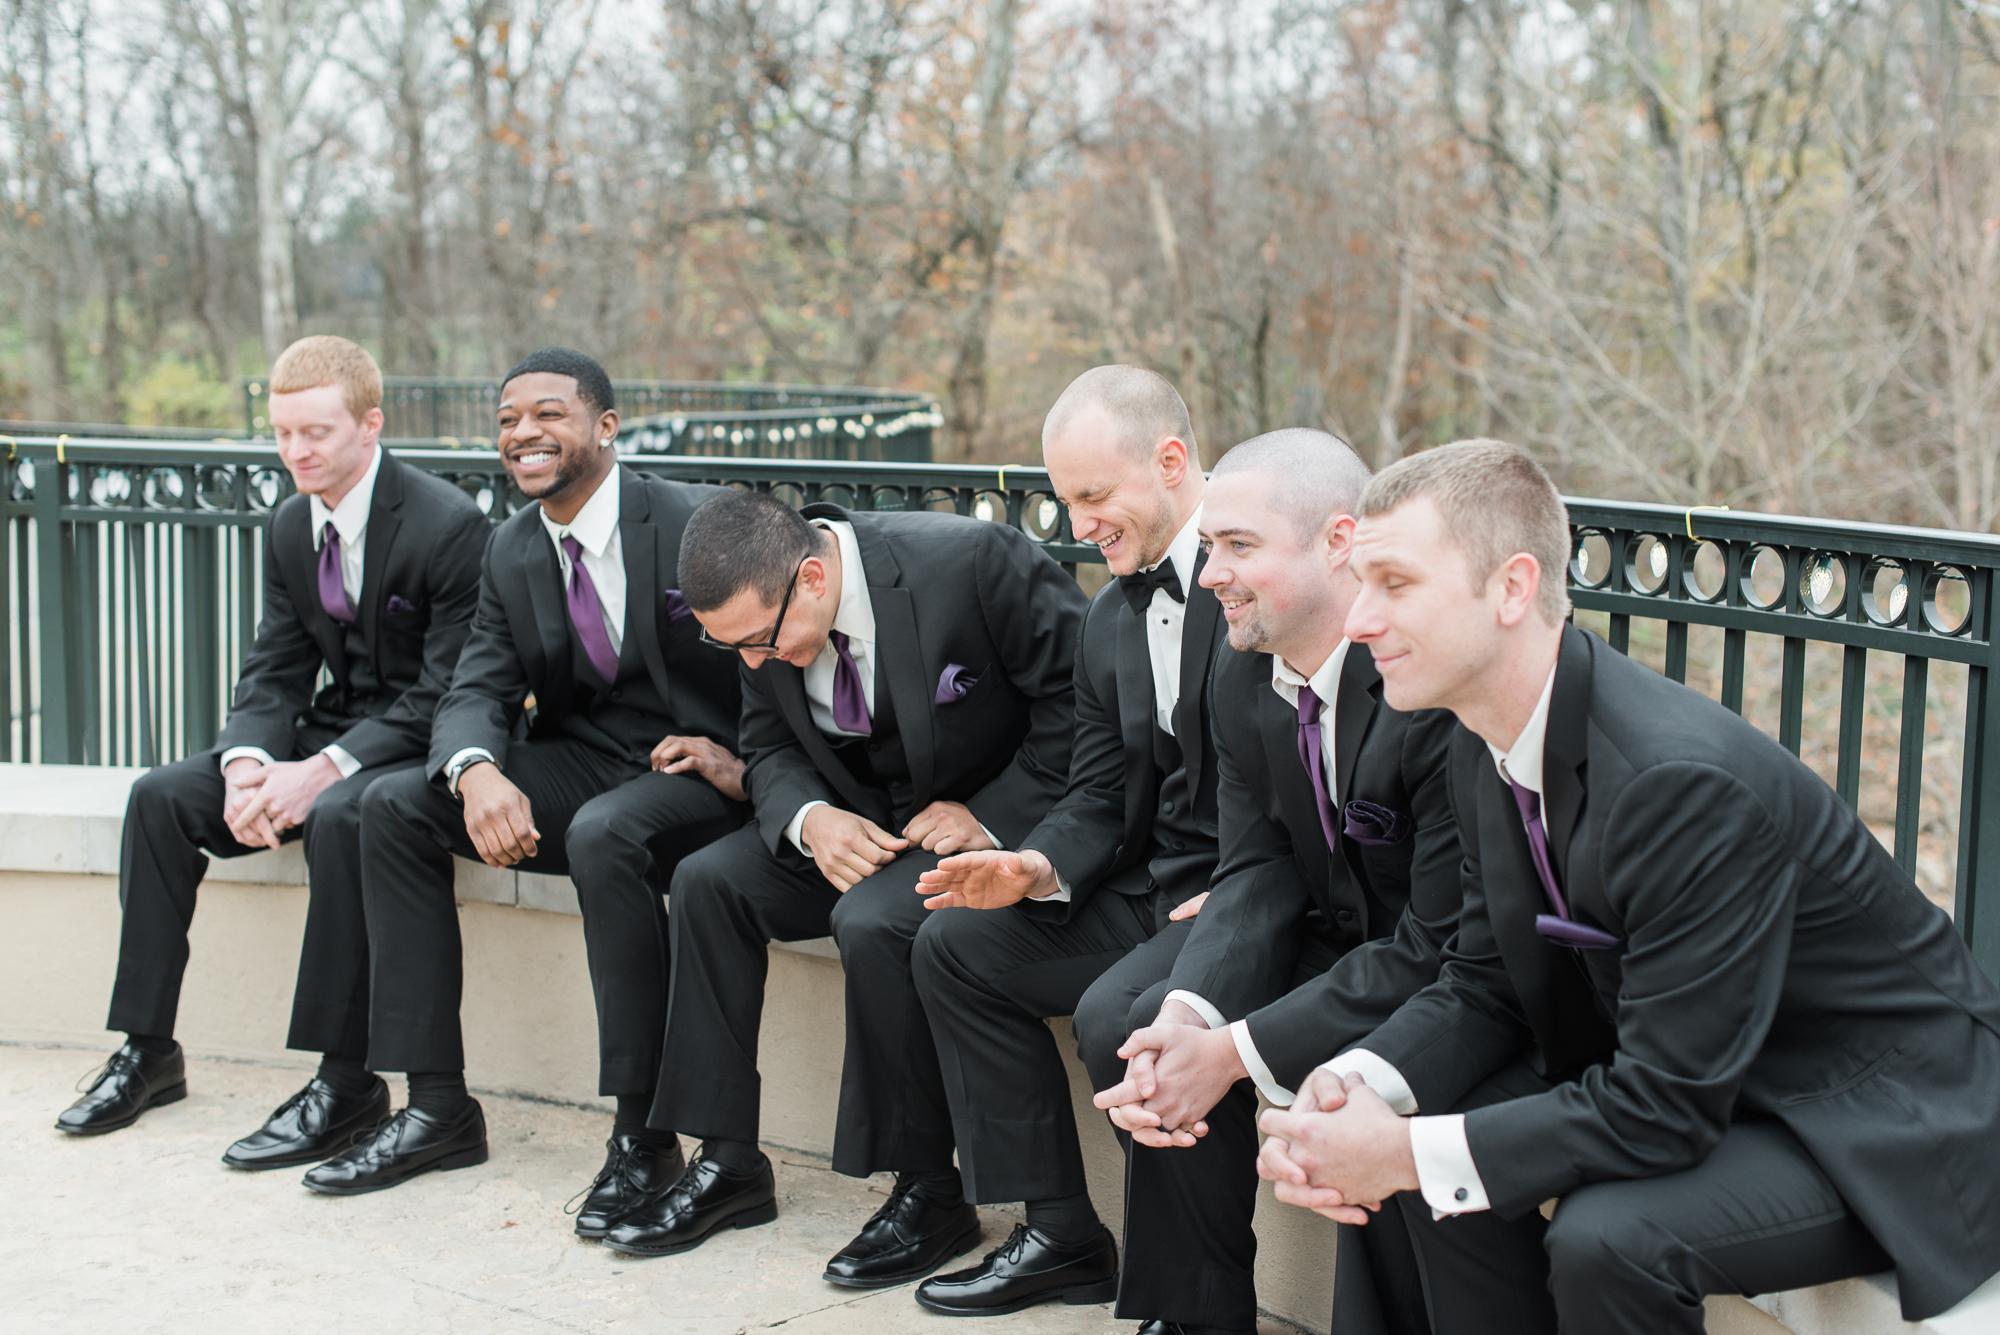 outdoor-wedding-november-bride-groom-black-tie-columbus-photographer-ohio-wedding-creekside-conference-1.jpg